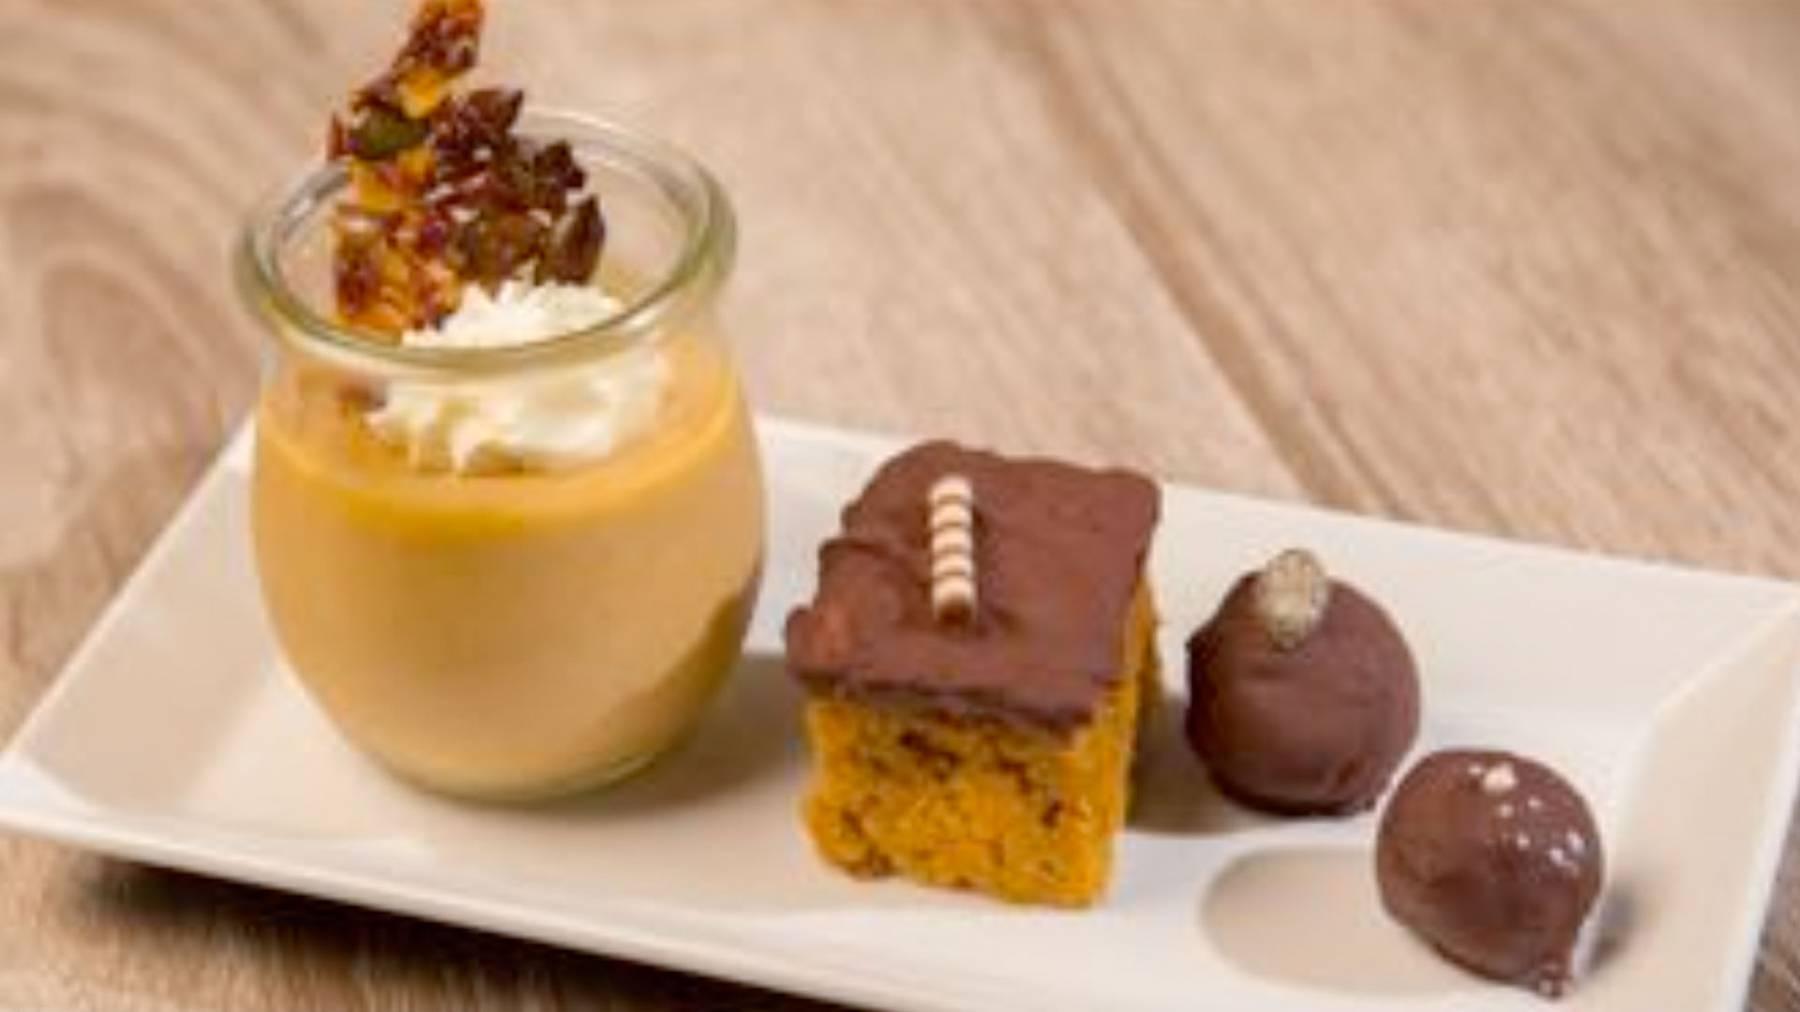 Kürbis-Dessert im Glas